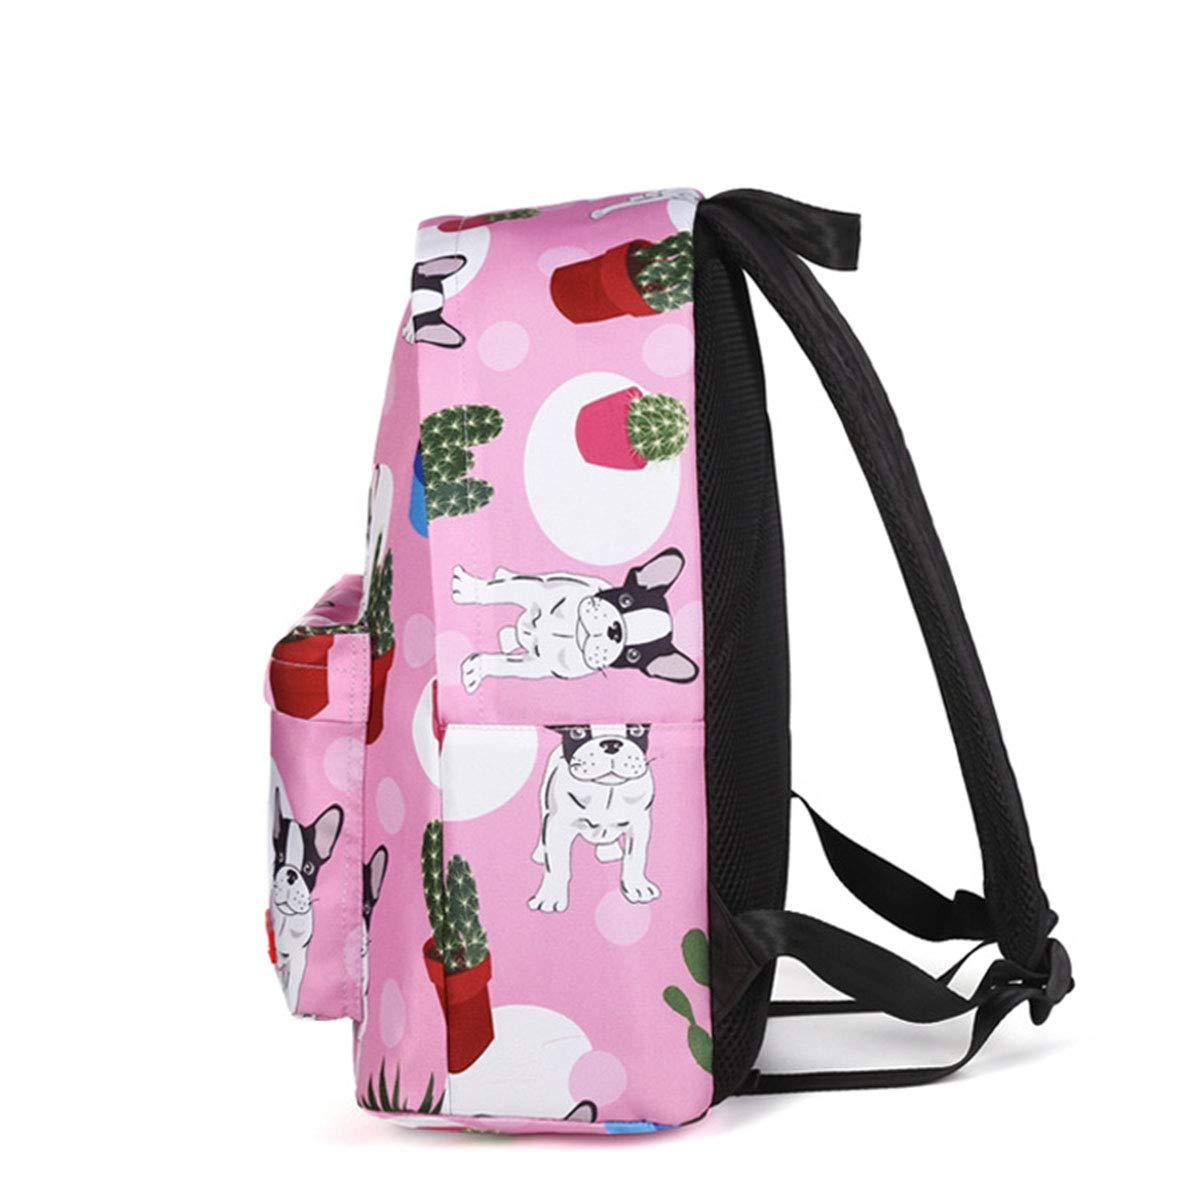 0a5dd27e6c7e Amazon.com: HWX Backpack for Girls: Fun & Funky Rucksack School Bag ...